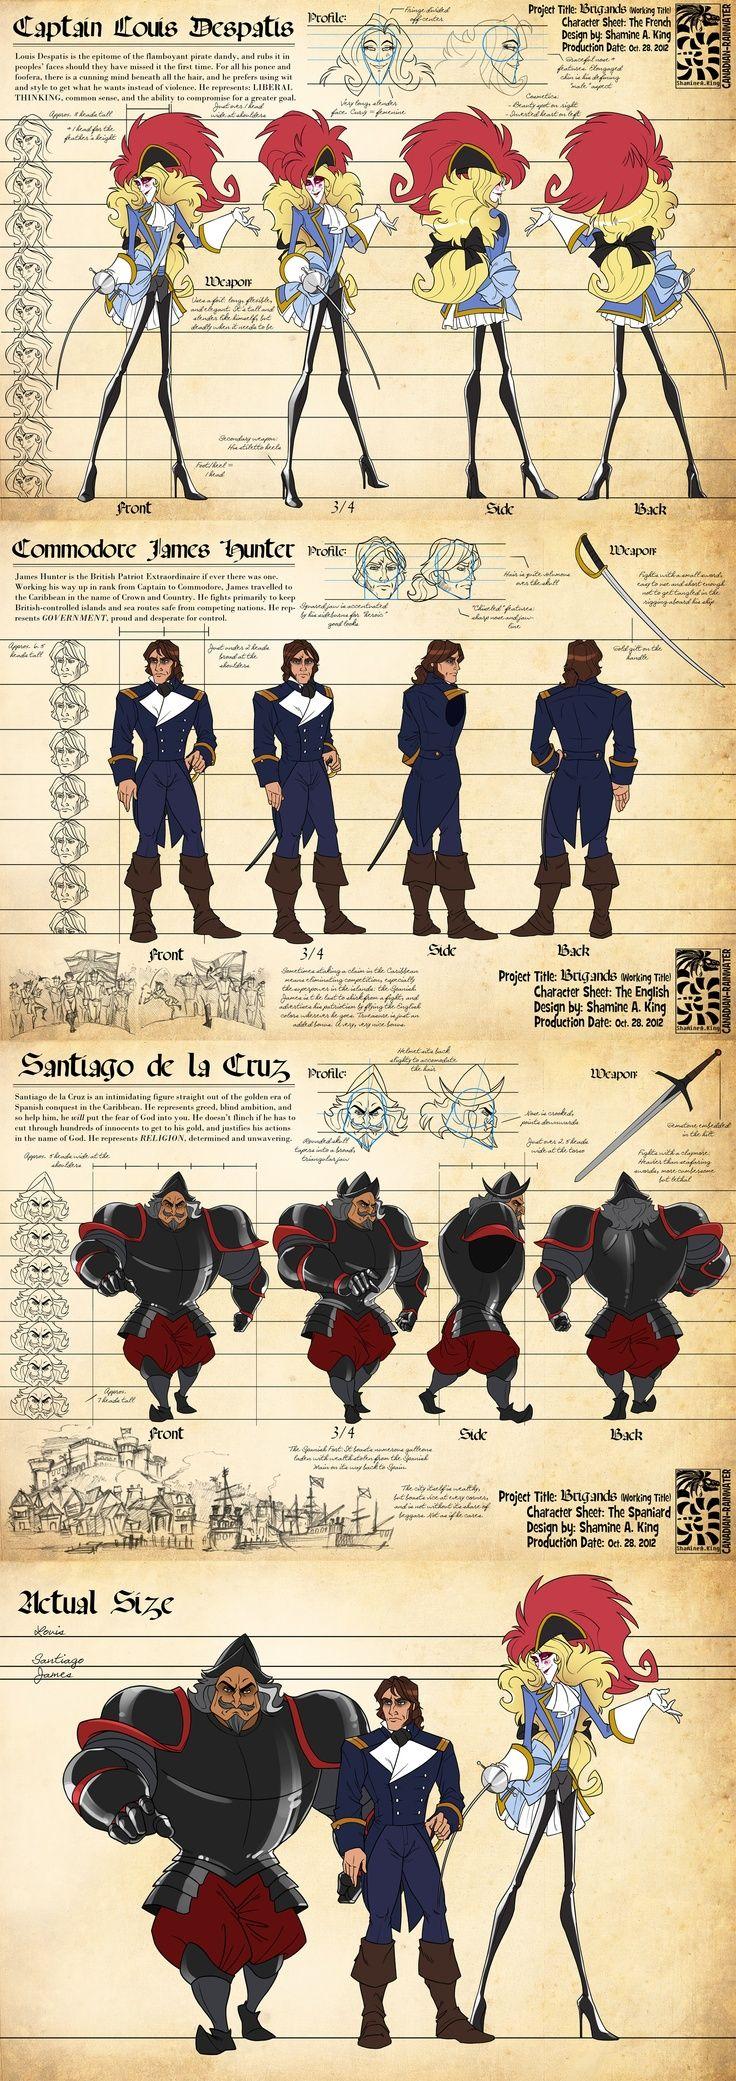 Karakter Kıyafetleri - Ortaçağ ve Rönesans / Character Outfit - Medieval &…